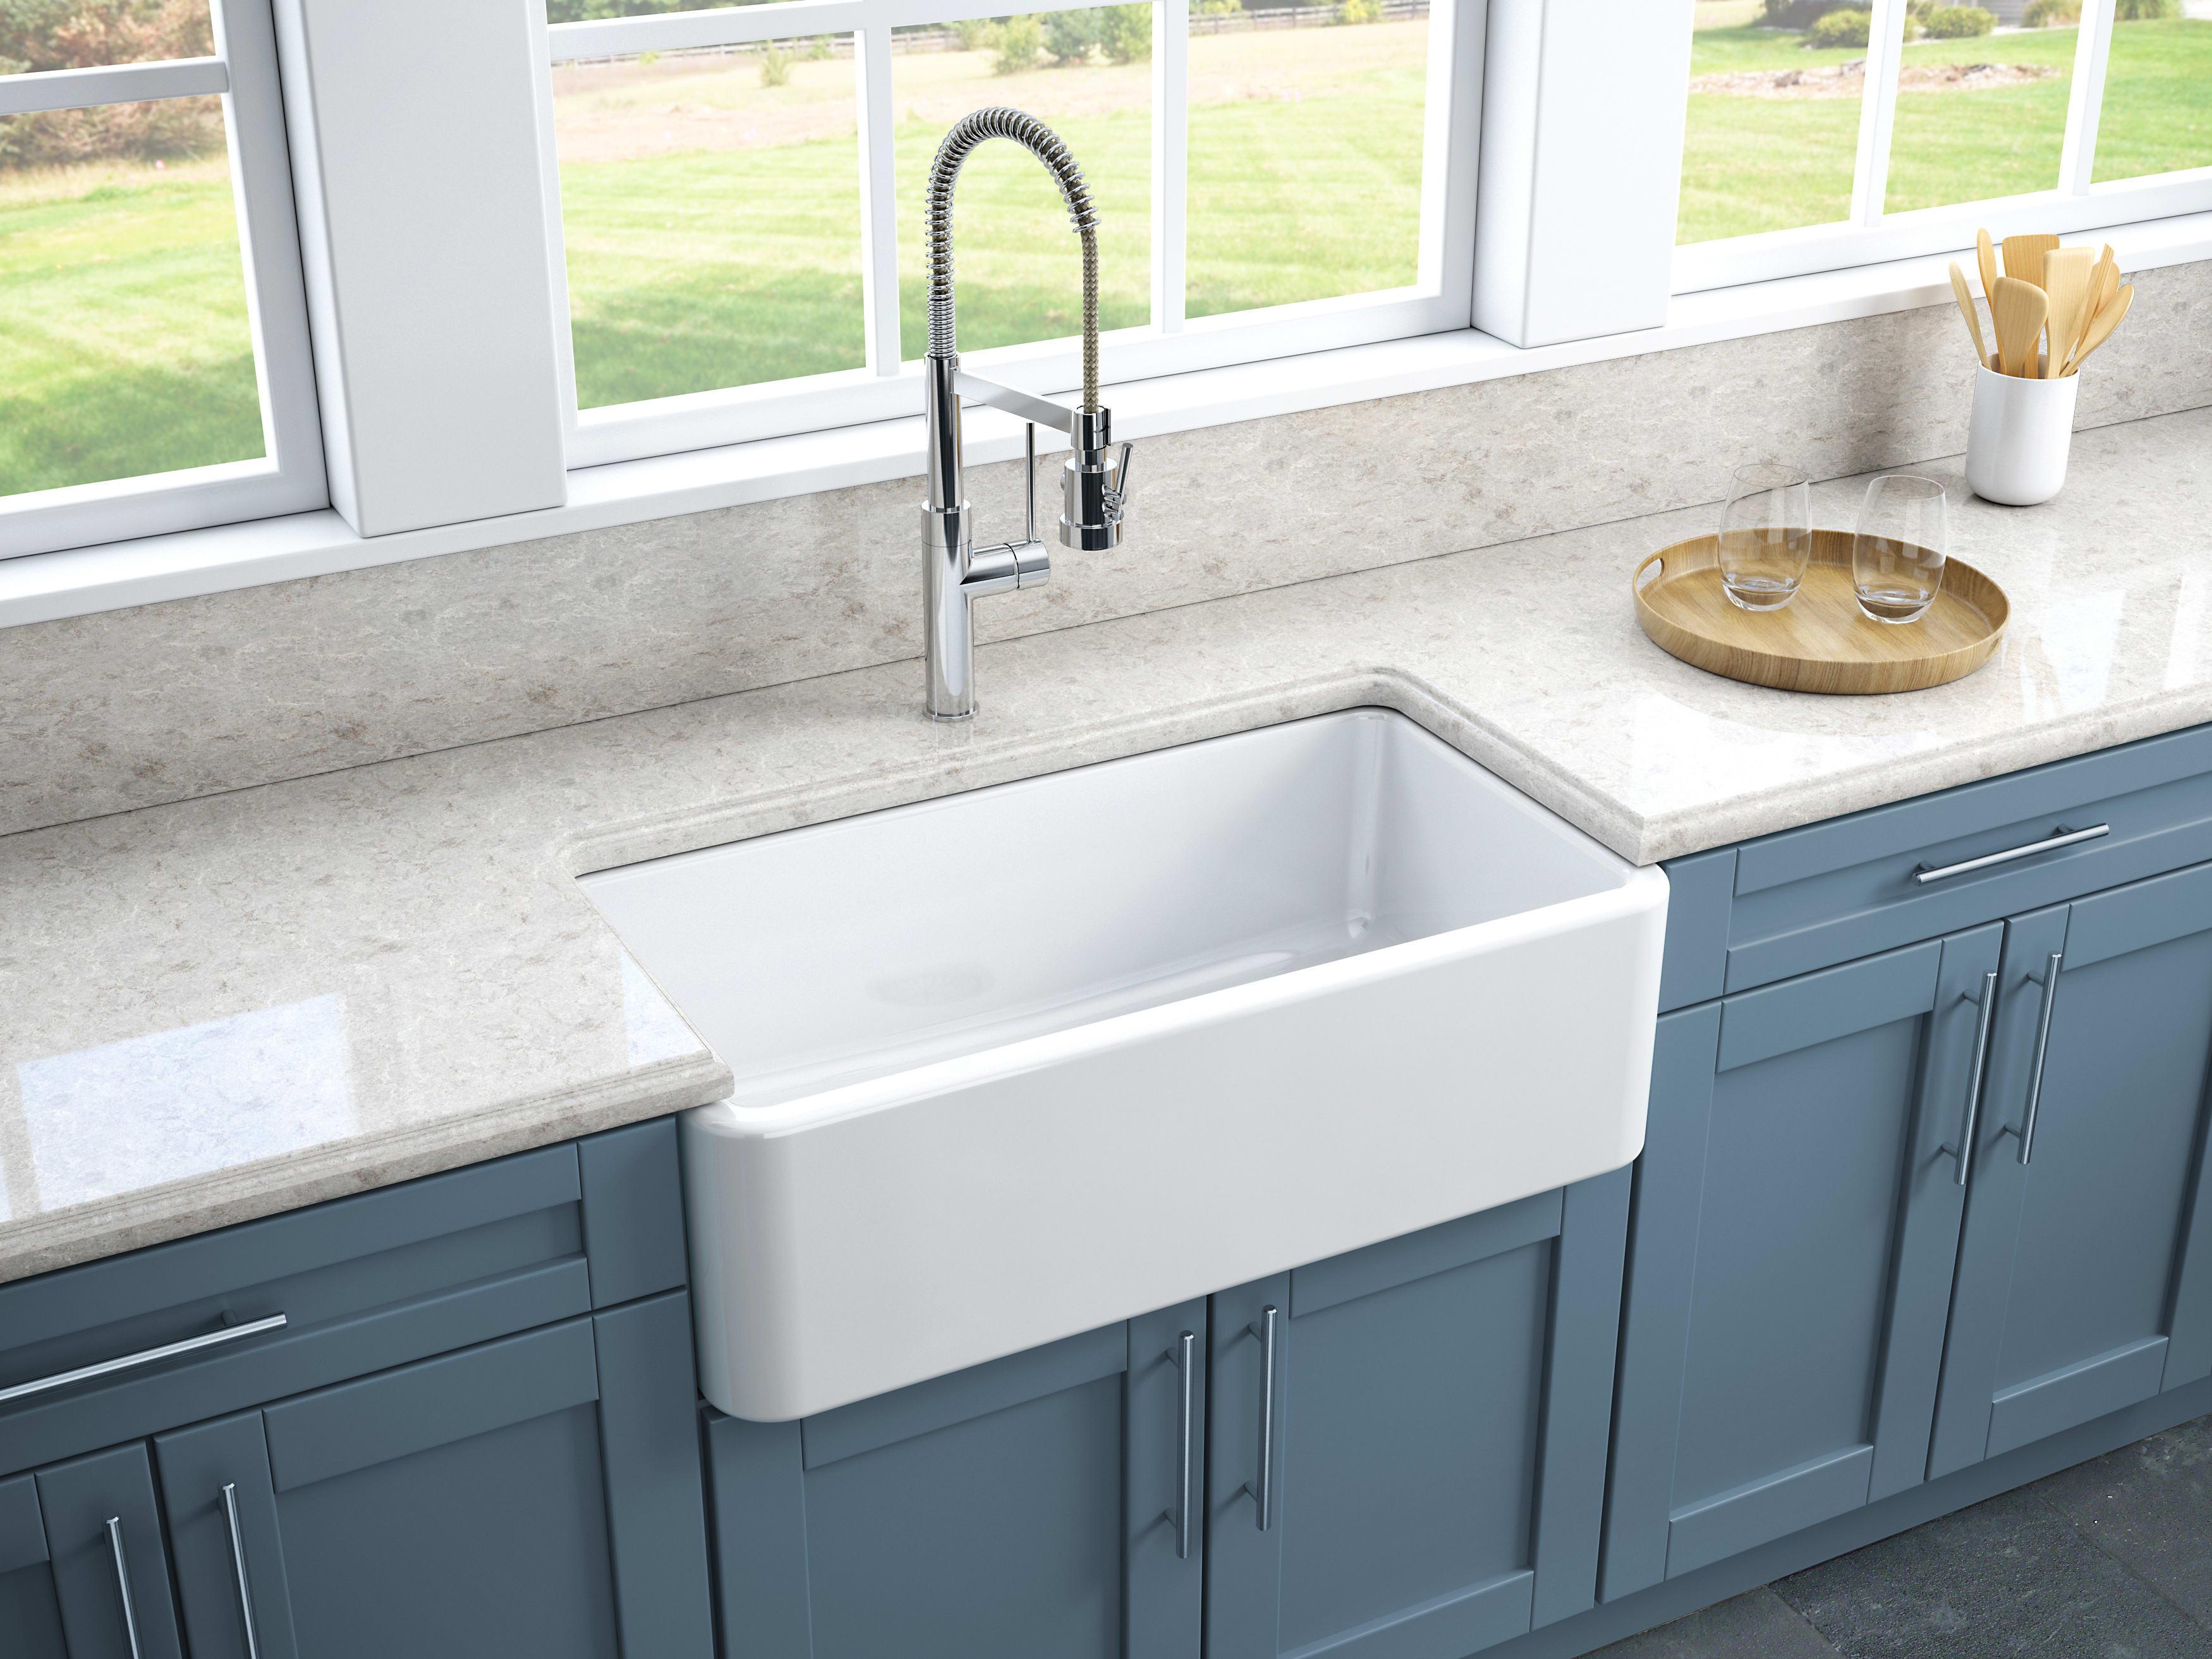 Latoscana Lfs3318 33 Reversible Fireclay Farmhouse Sink Qualitybath Com